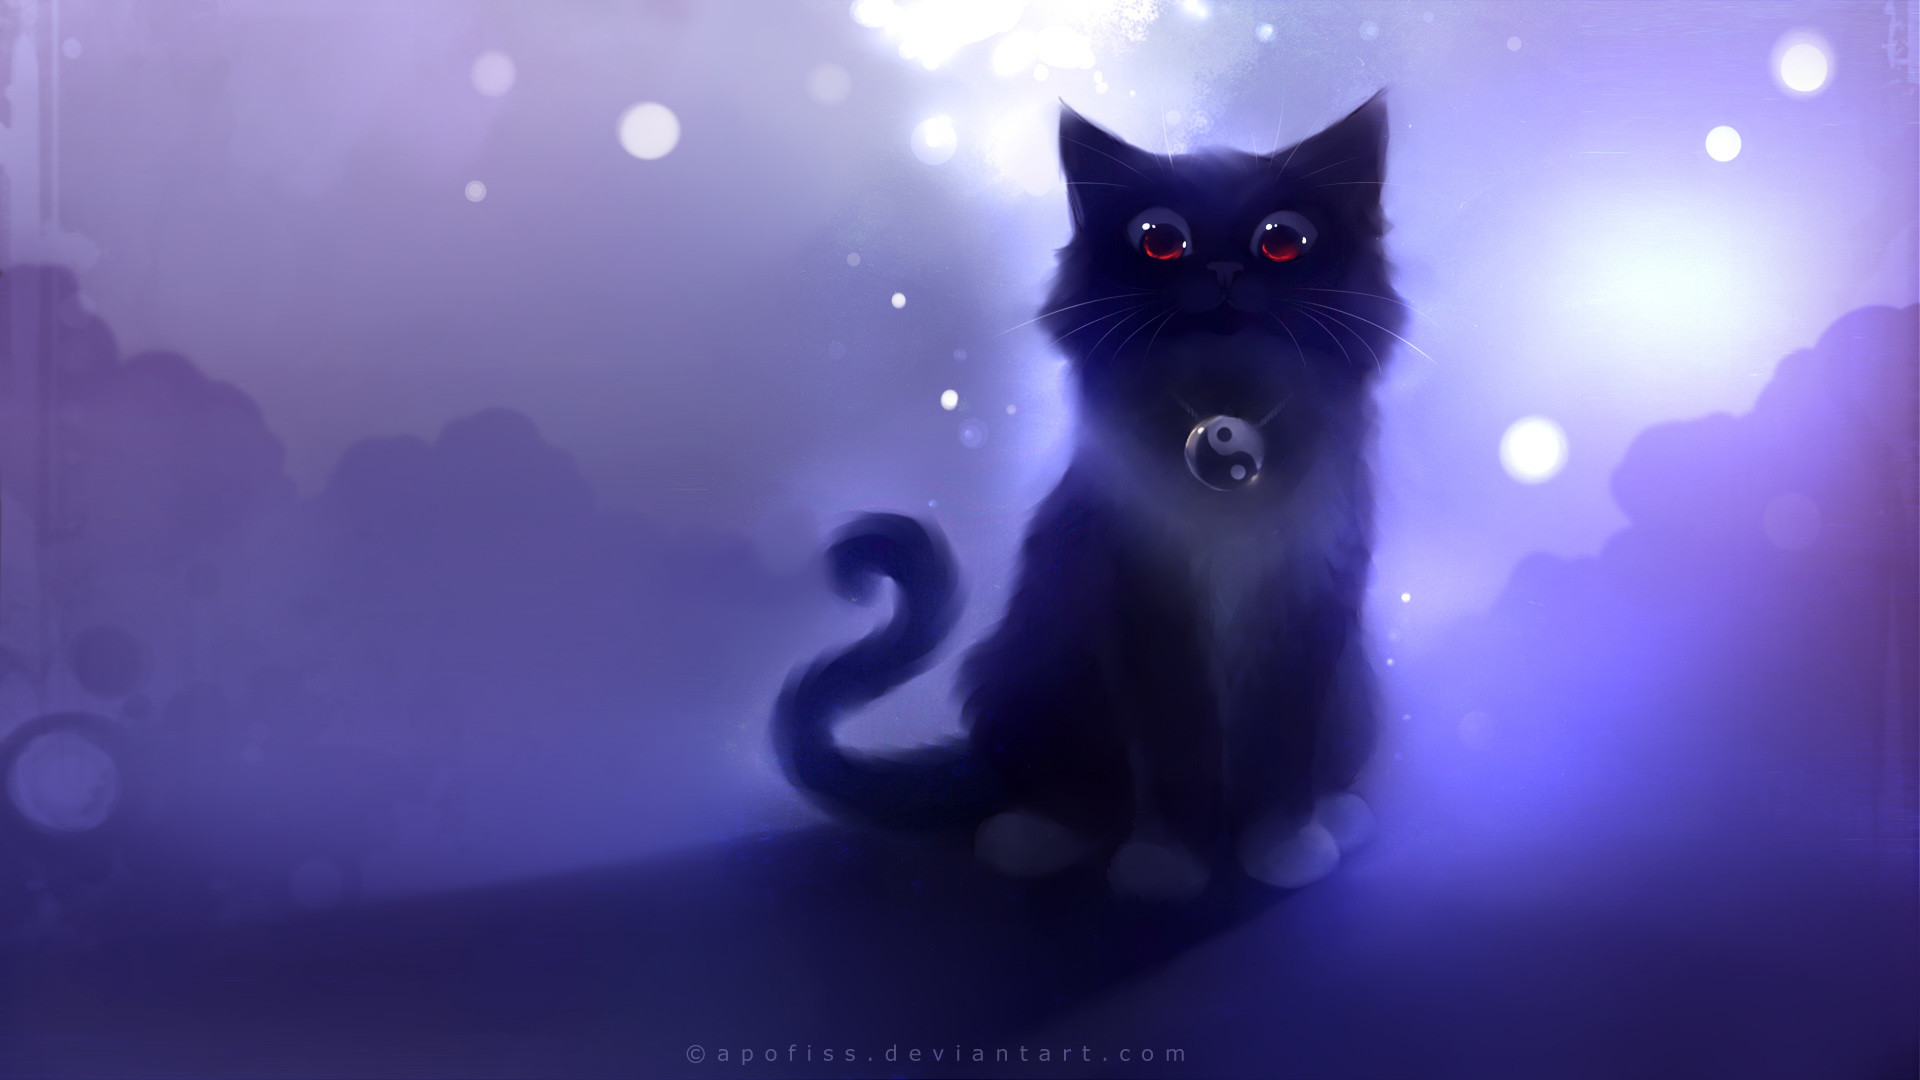 Res: 1920x1080,  Download Wallpaper  Cat, Black, Drawing, Night, Apofiss